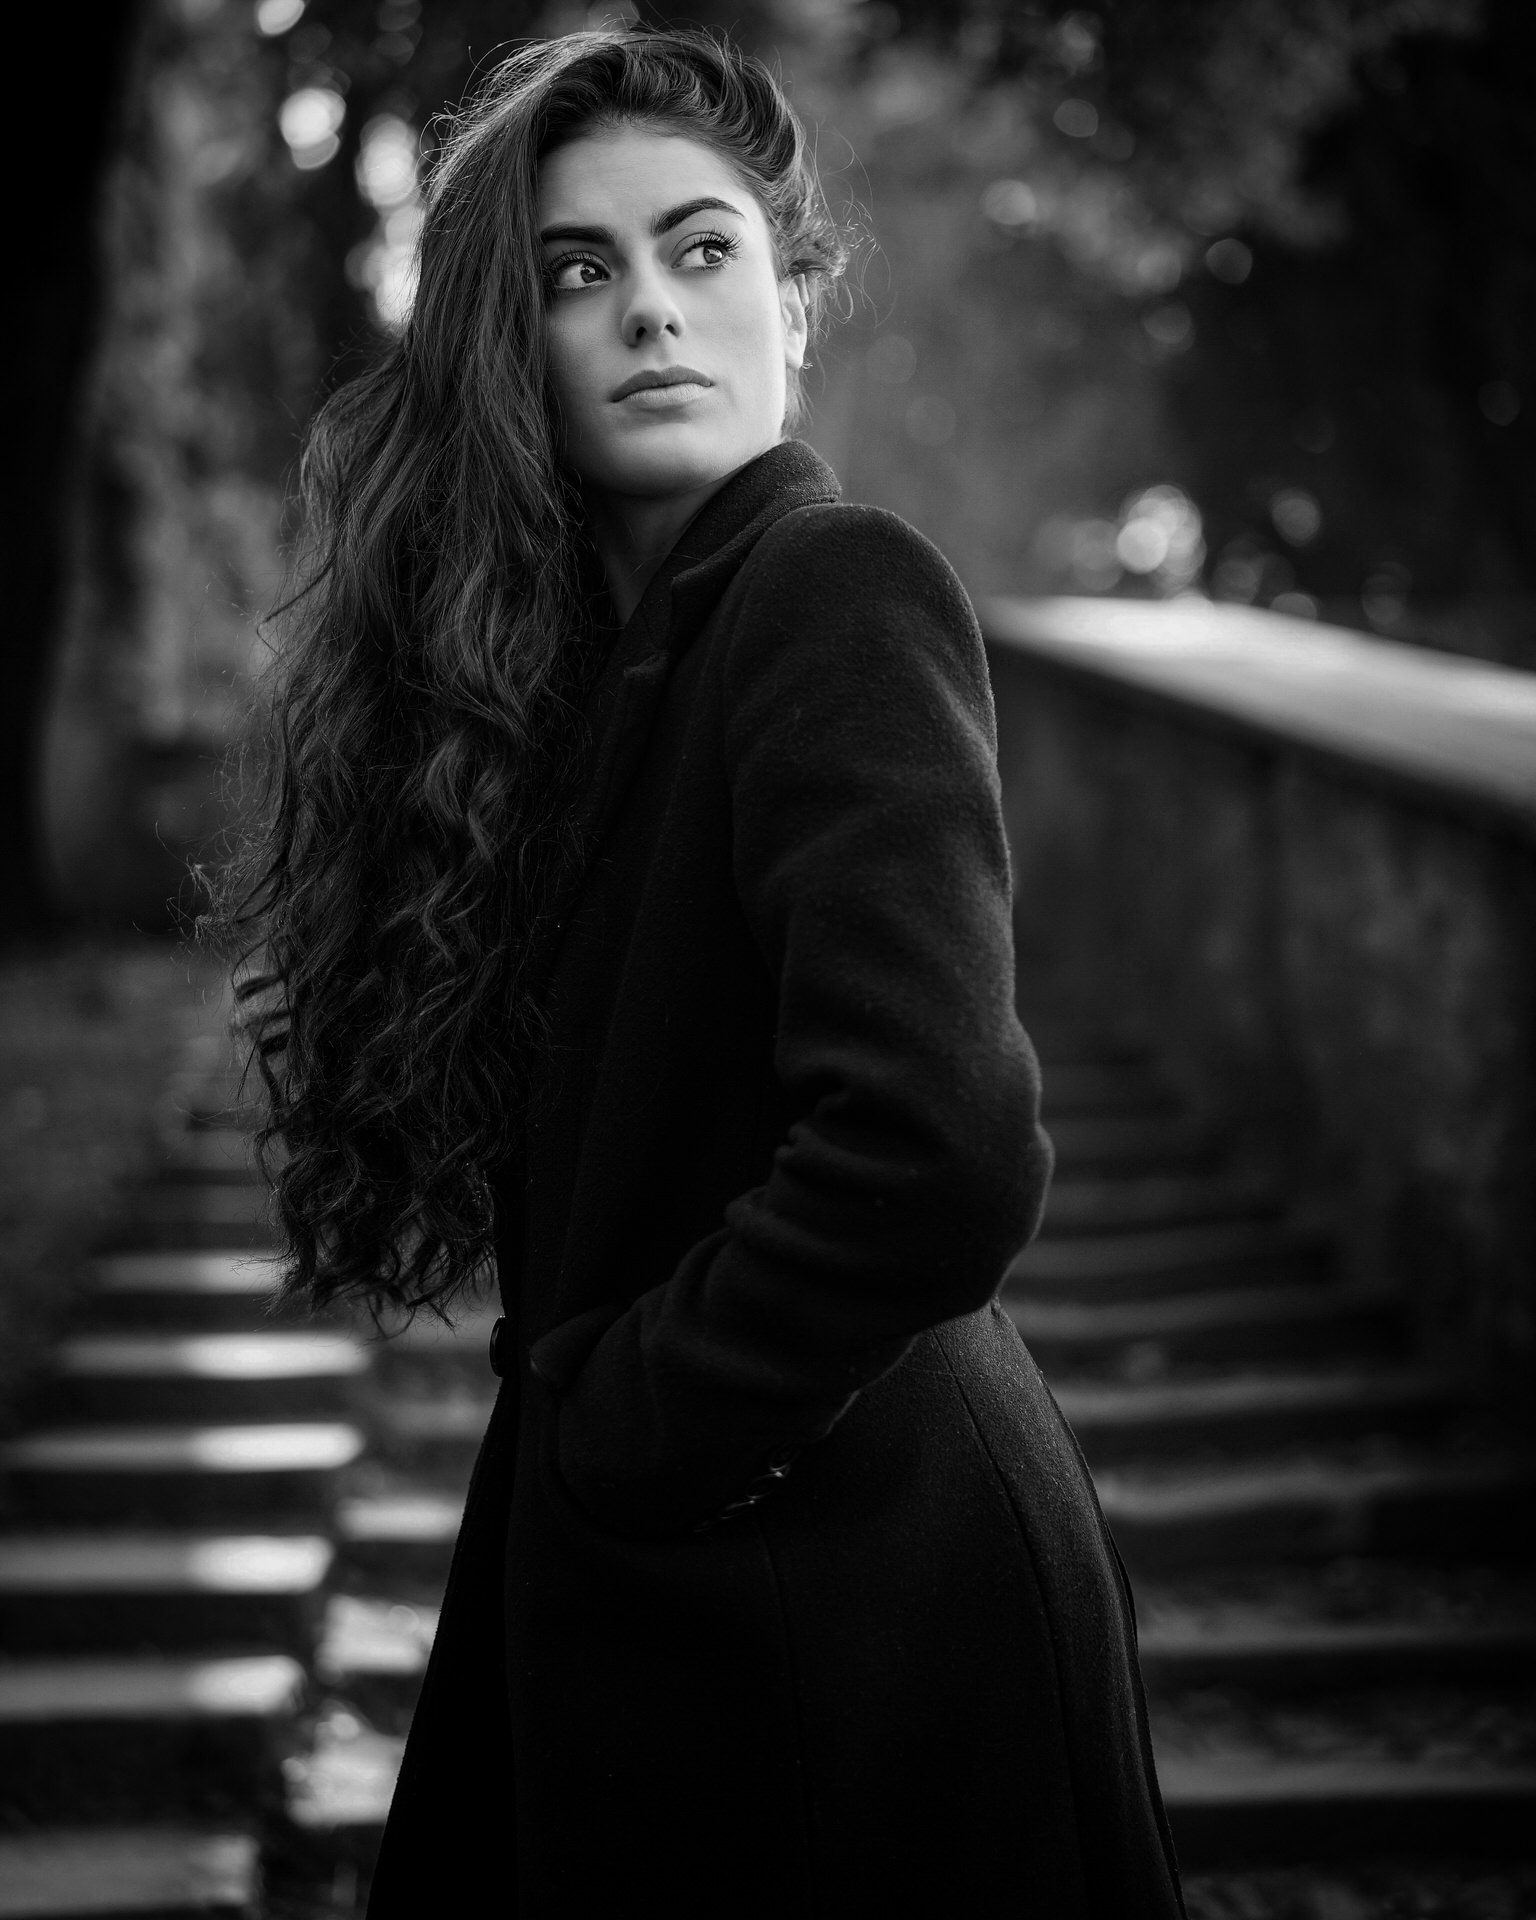 VENUS Gallery - Manuel Boschi Photographer